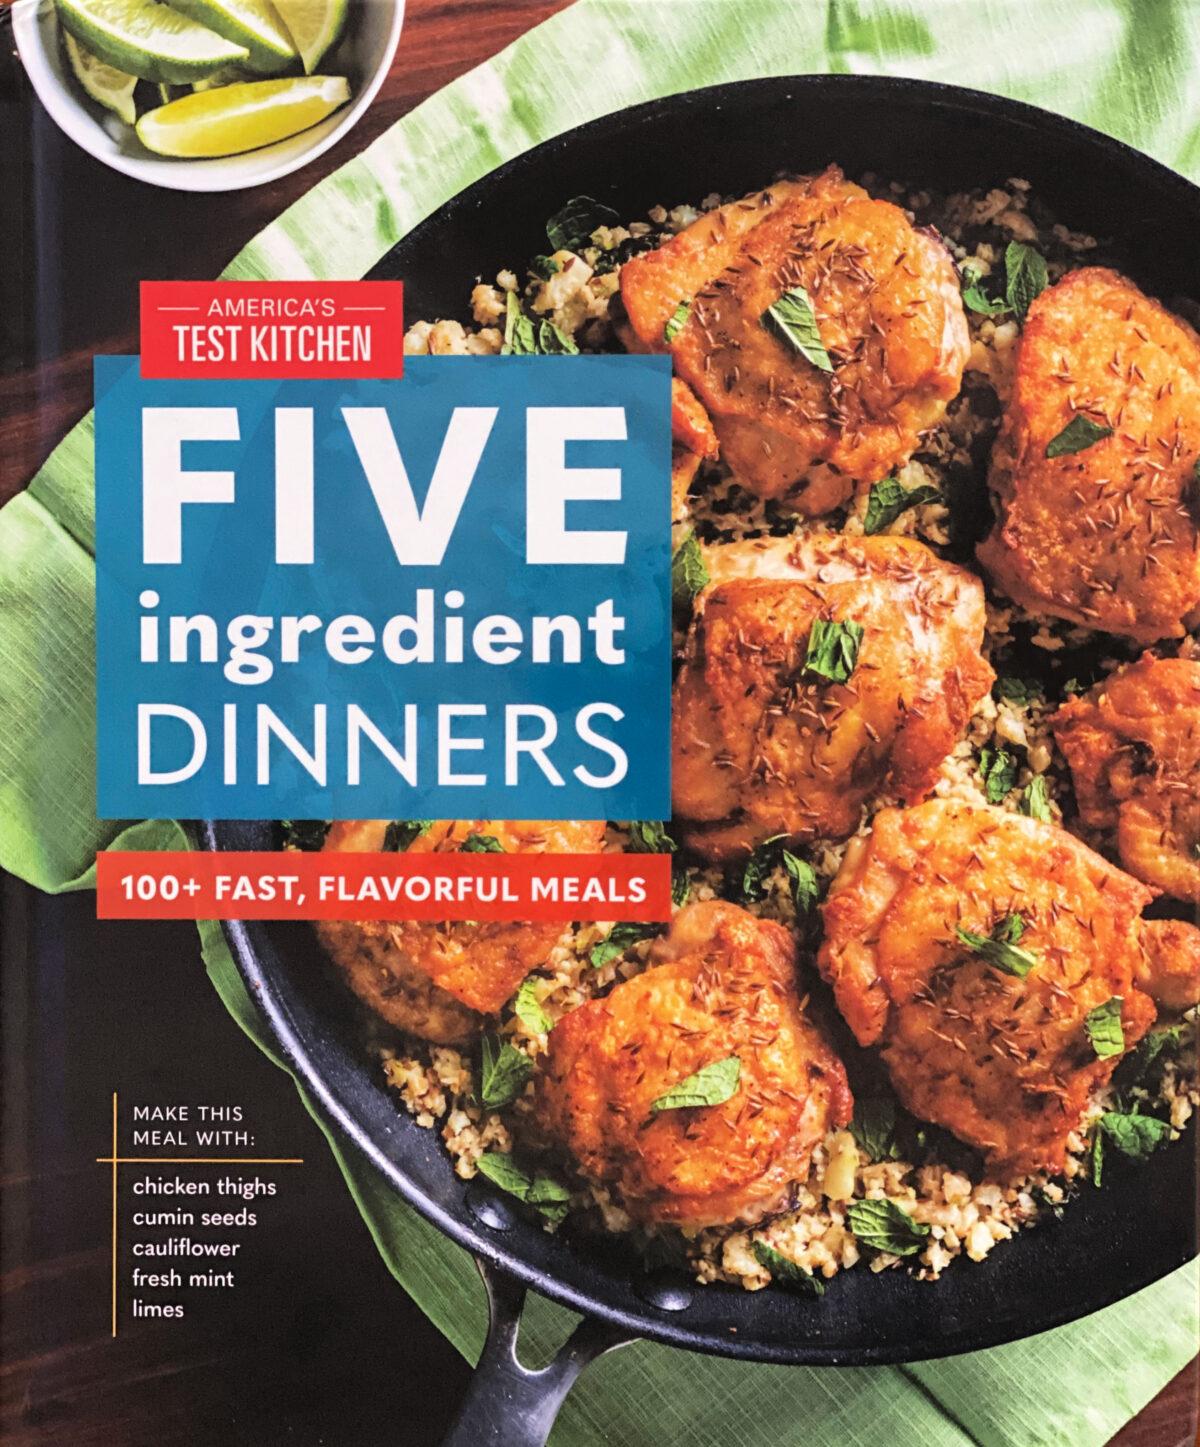 Five Ingredient Dinners cookbook.